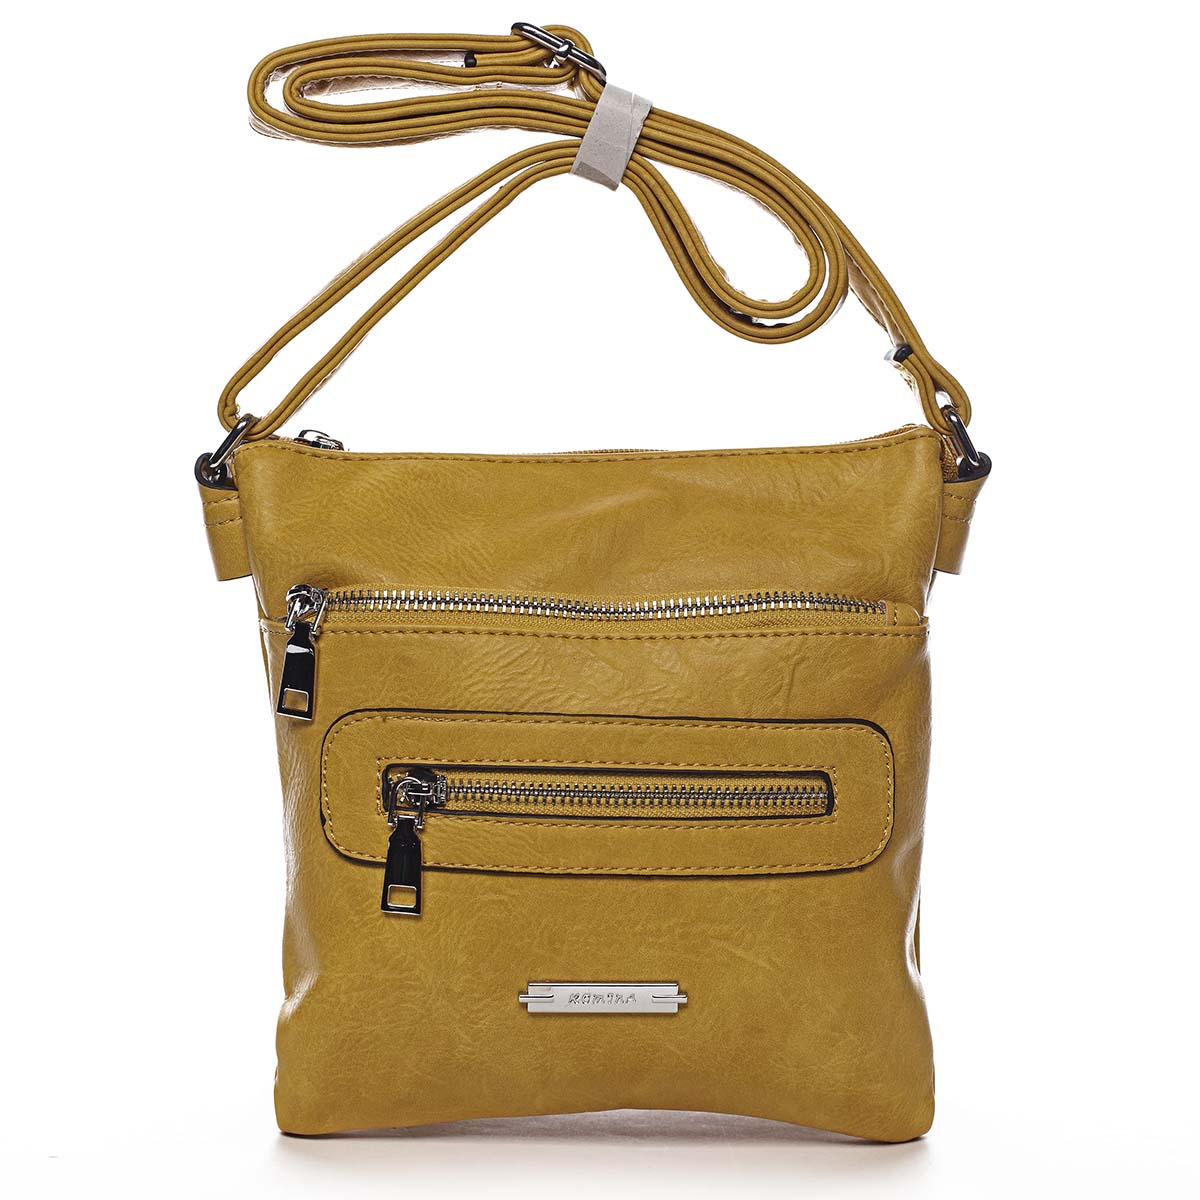 Dámská crossbody kabelka žlutá - Romina Chasing žlutá